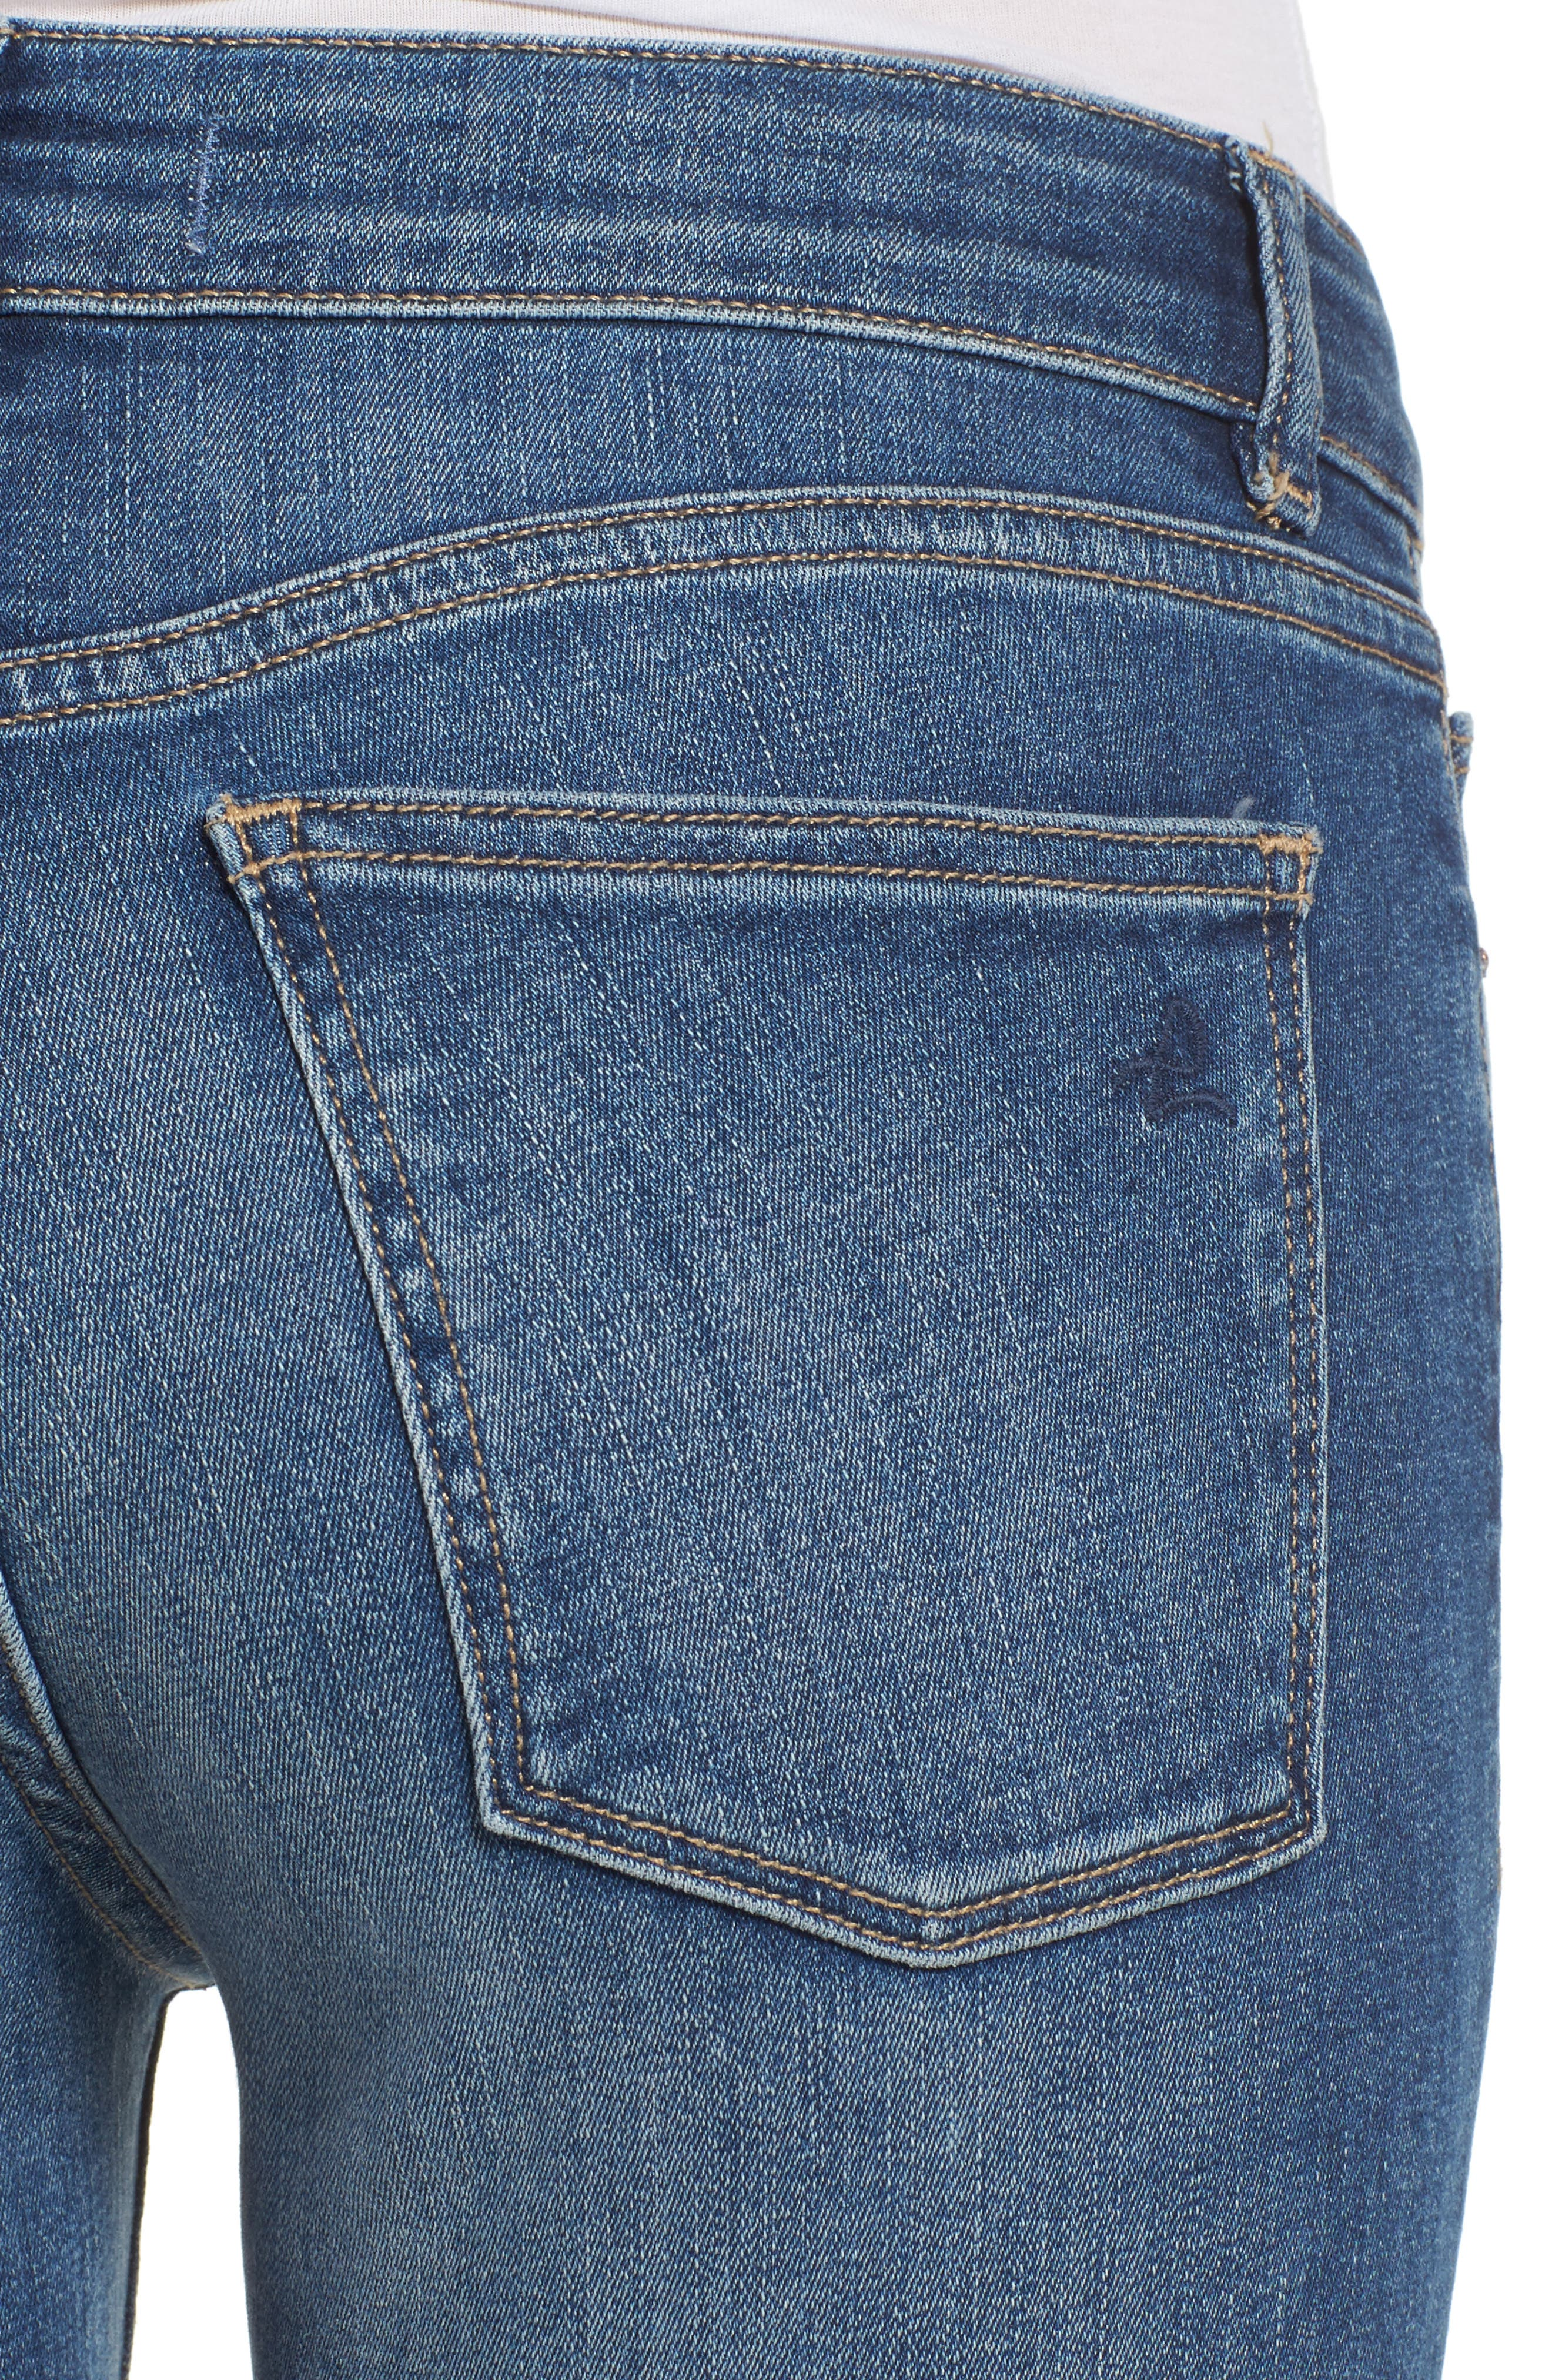 Florence Instasculpt Crop Skinny Jeans,                             Alternate thumbnail 4, color,                             EVERGLADE